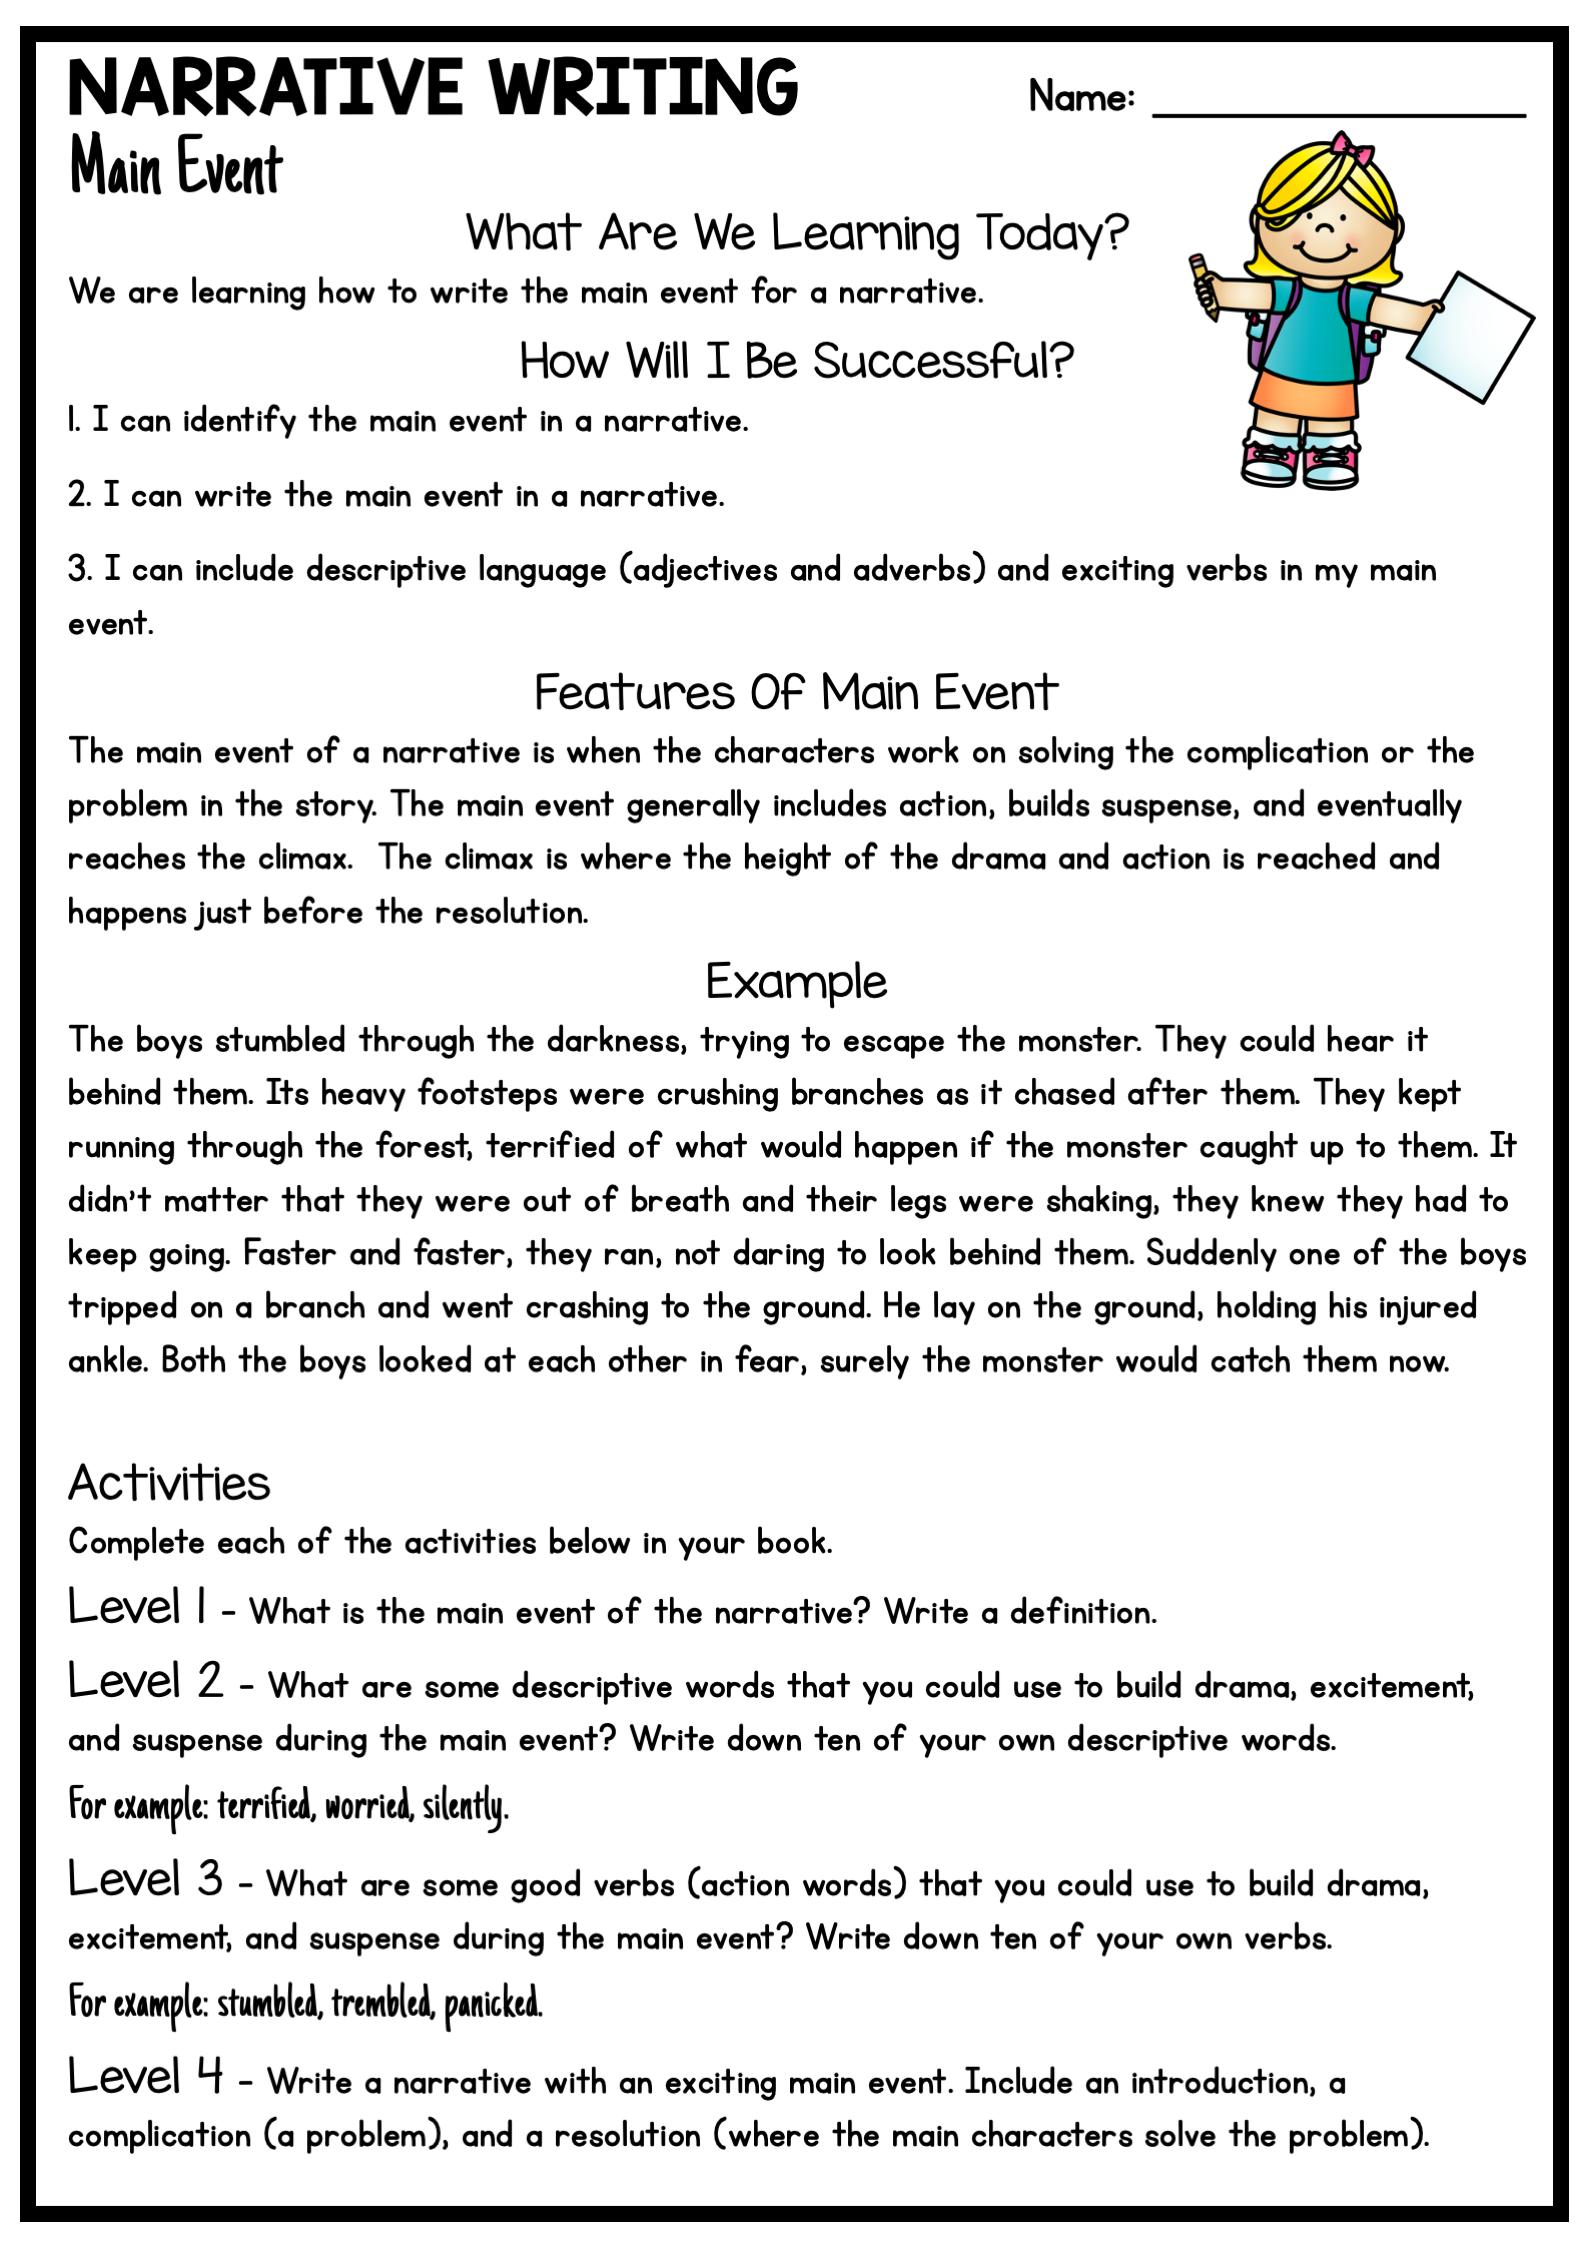 Narrative Writing Write The Main Event Distance Learning Narrative Writing Student Reading Writing [ 2249 x 1589 Pixel ]